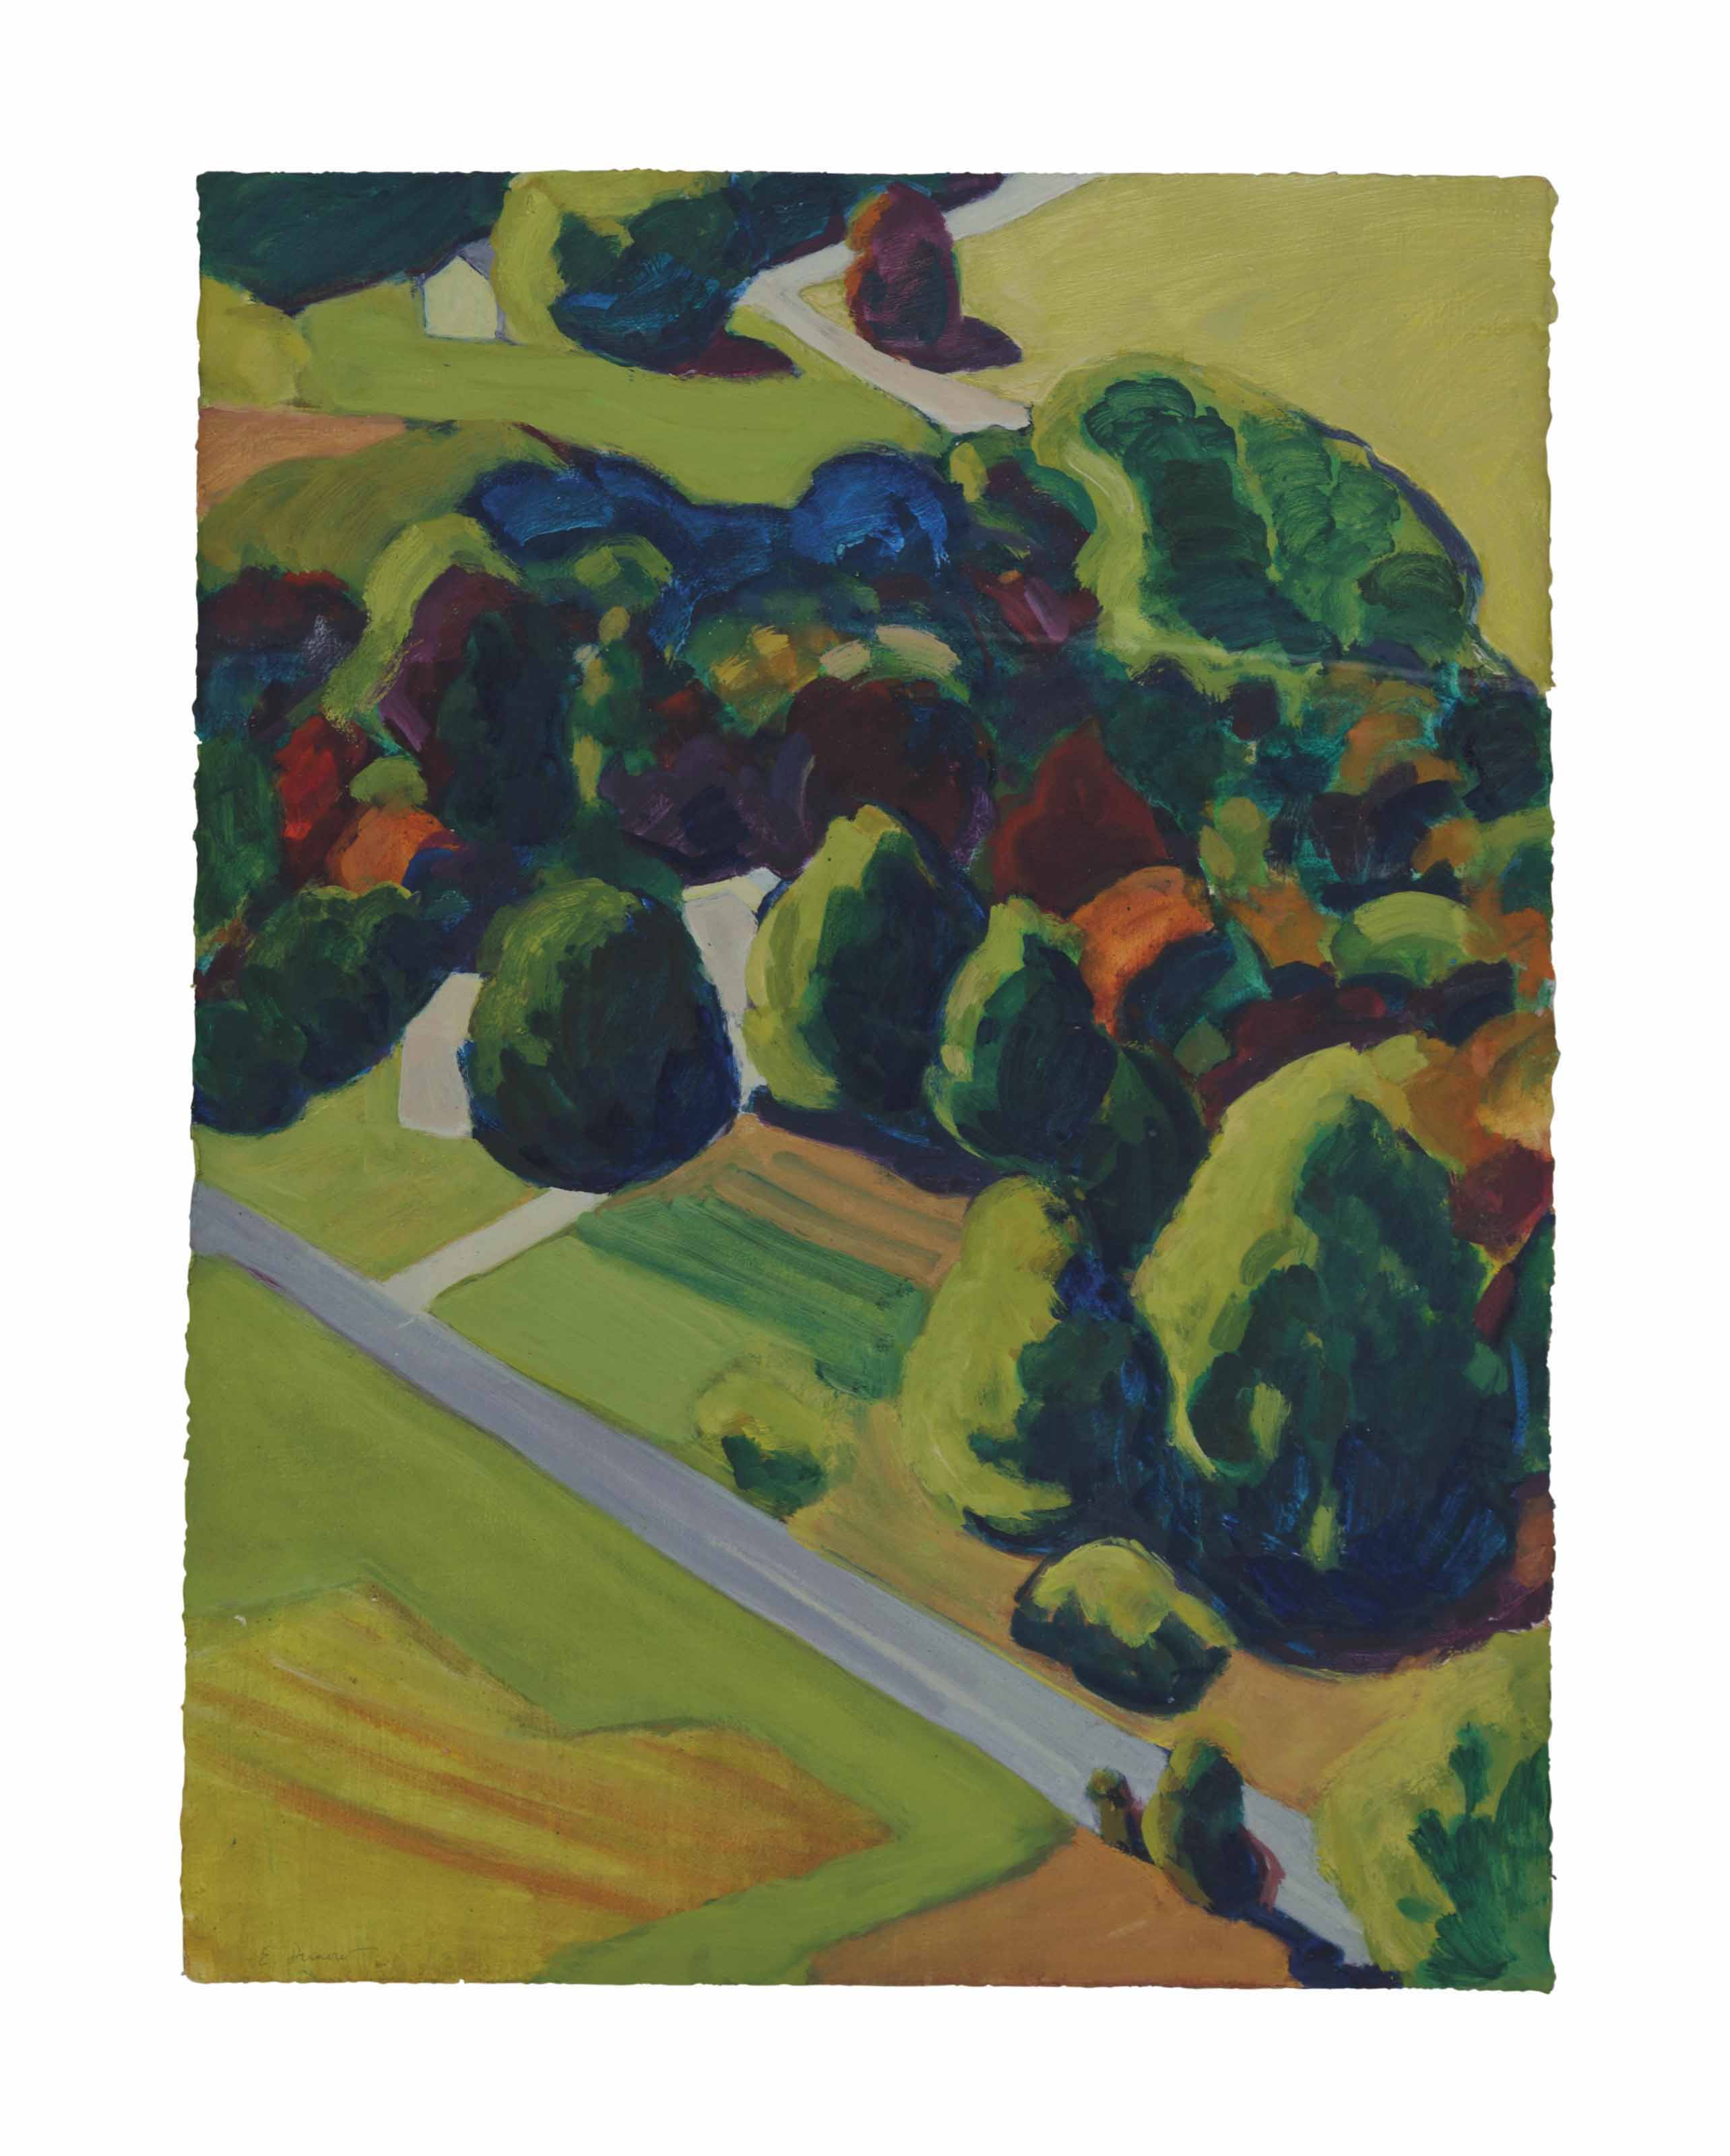 Esti Dunow (American, b. 1948)